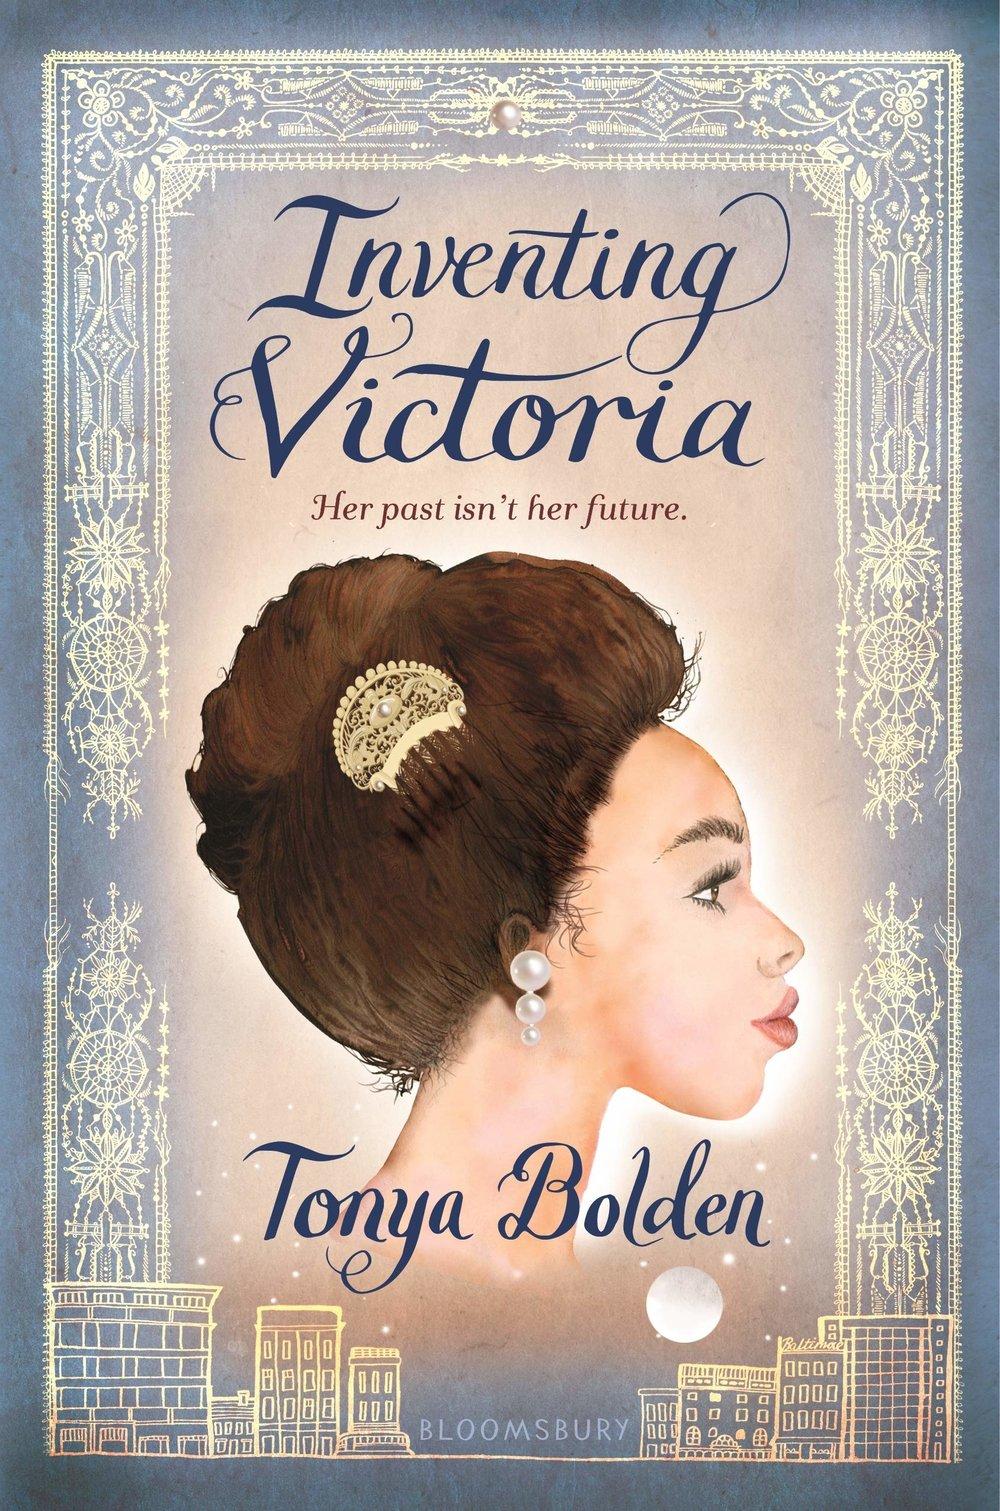 Inventing Victoria , by Tonya Bolden